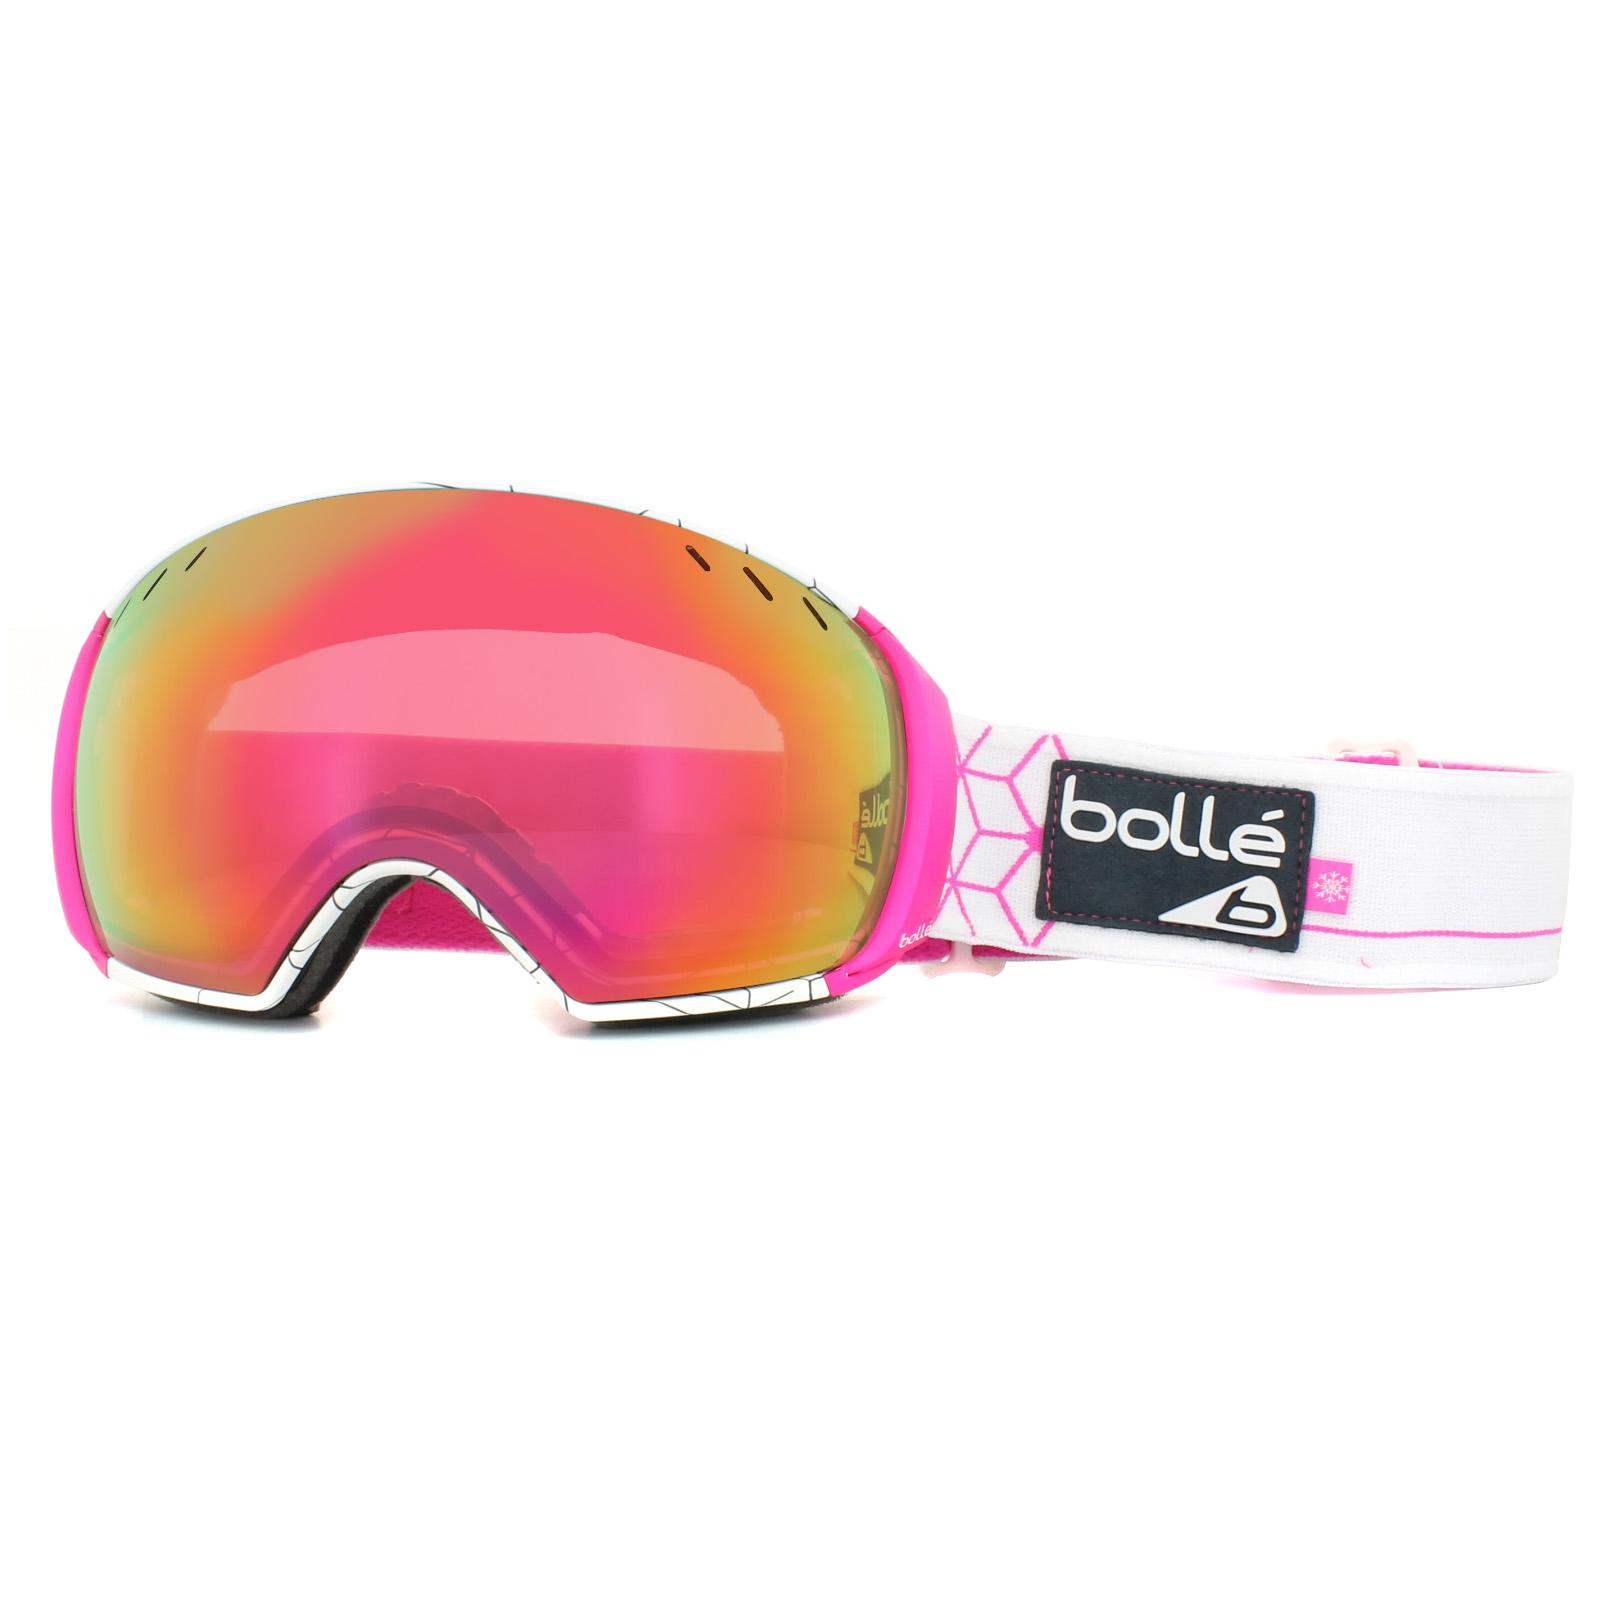 c4f93f903ce1 Sentinel Bolle Ski Goggles Virtuose 21436 White   Pink Iceberg Rose Gold    Lemon Gun. Sentinel Thumbnail 2